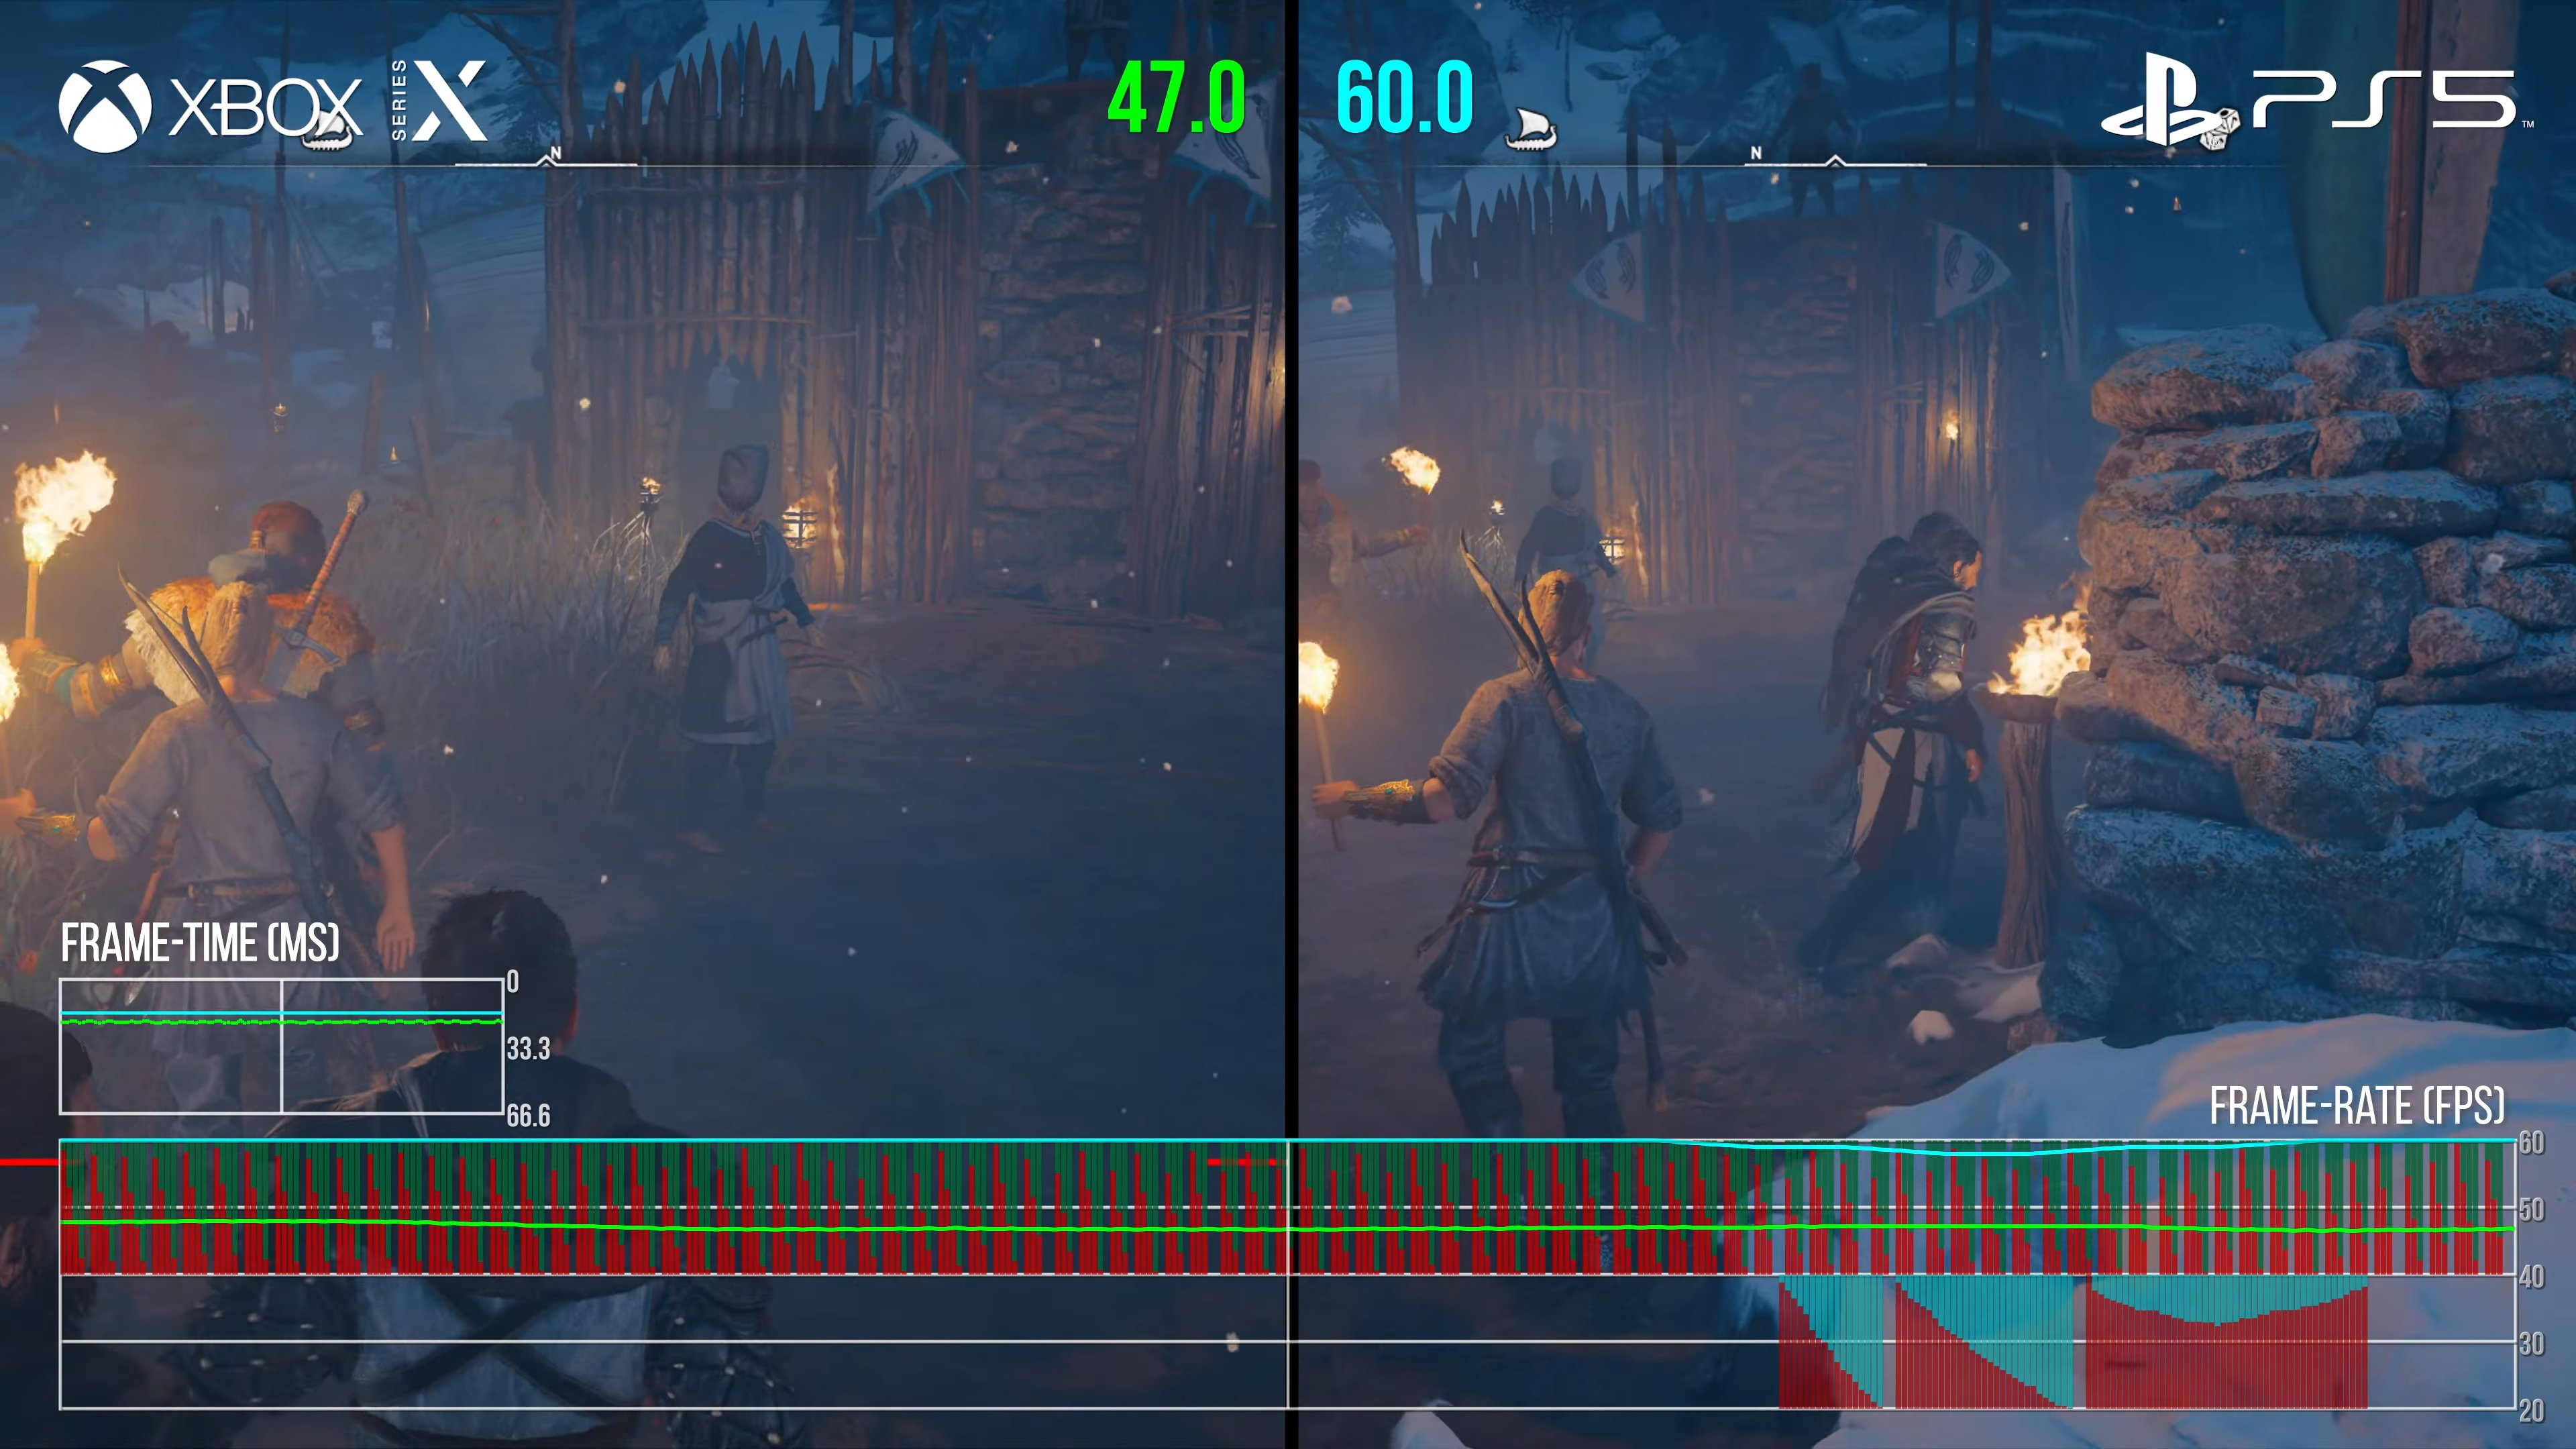 013218-Assassin's%20Creed%20Valhalla_%20